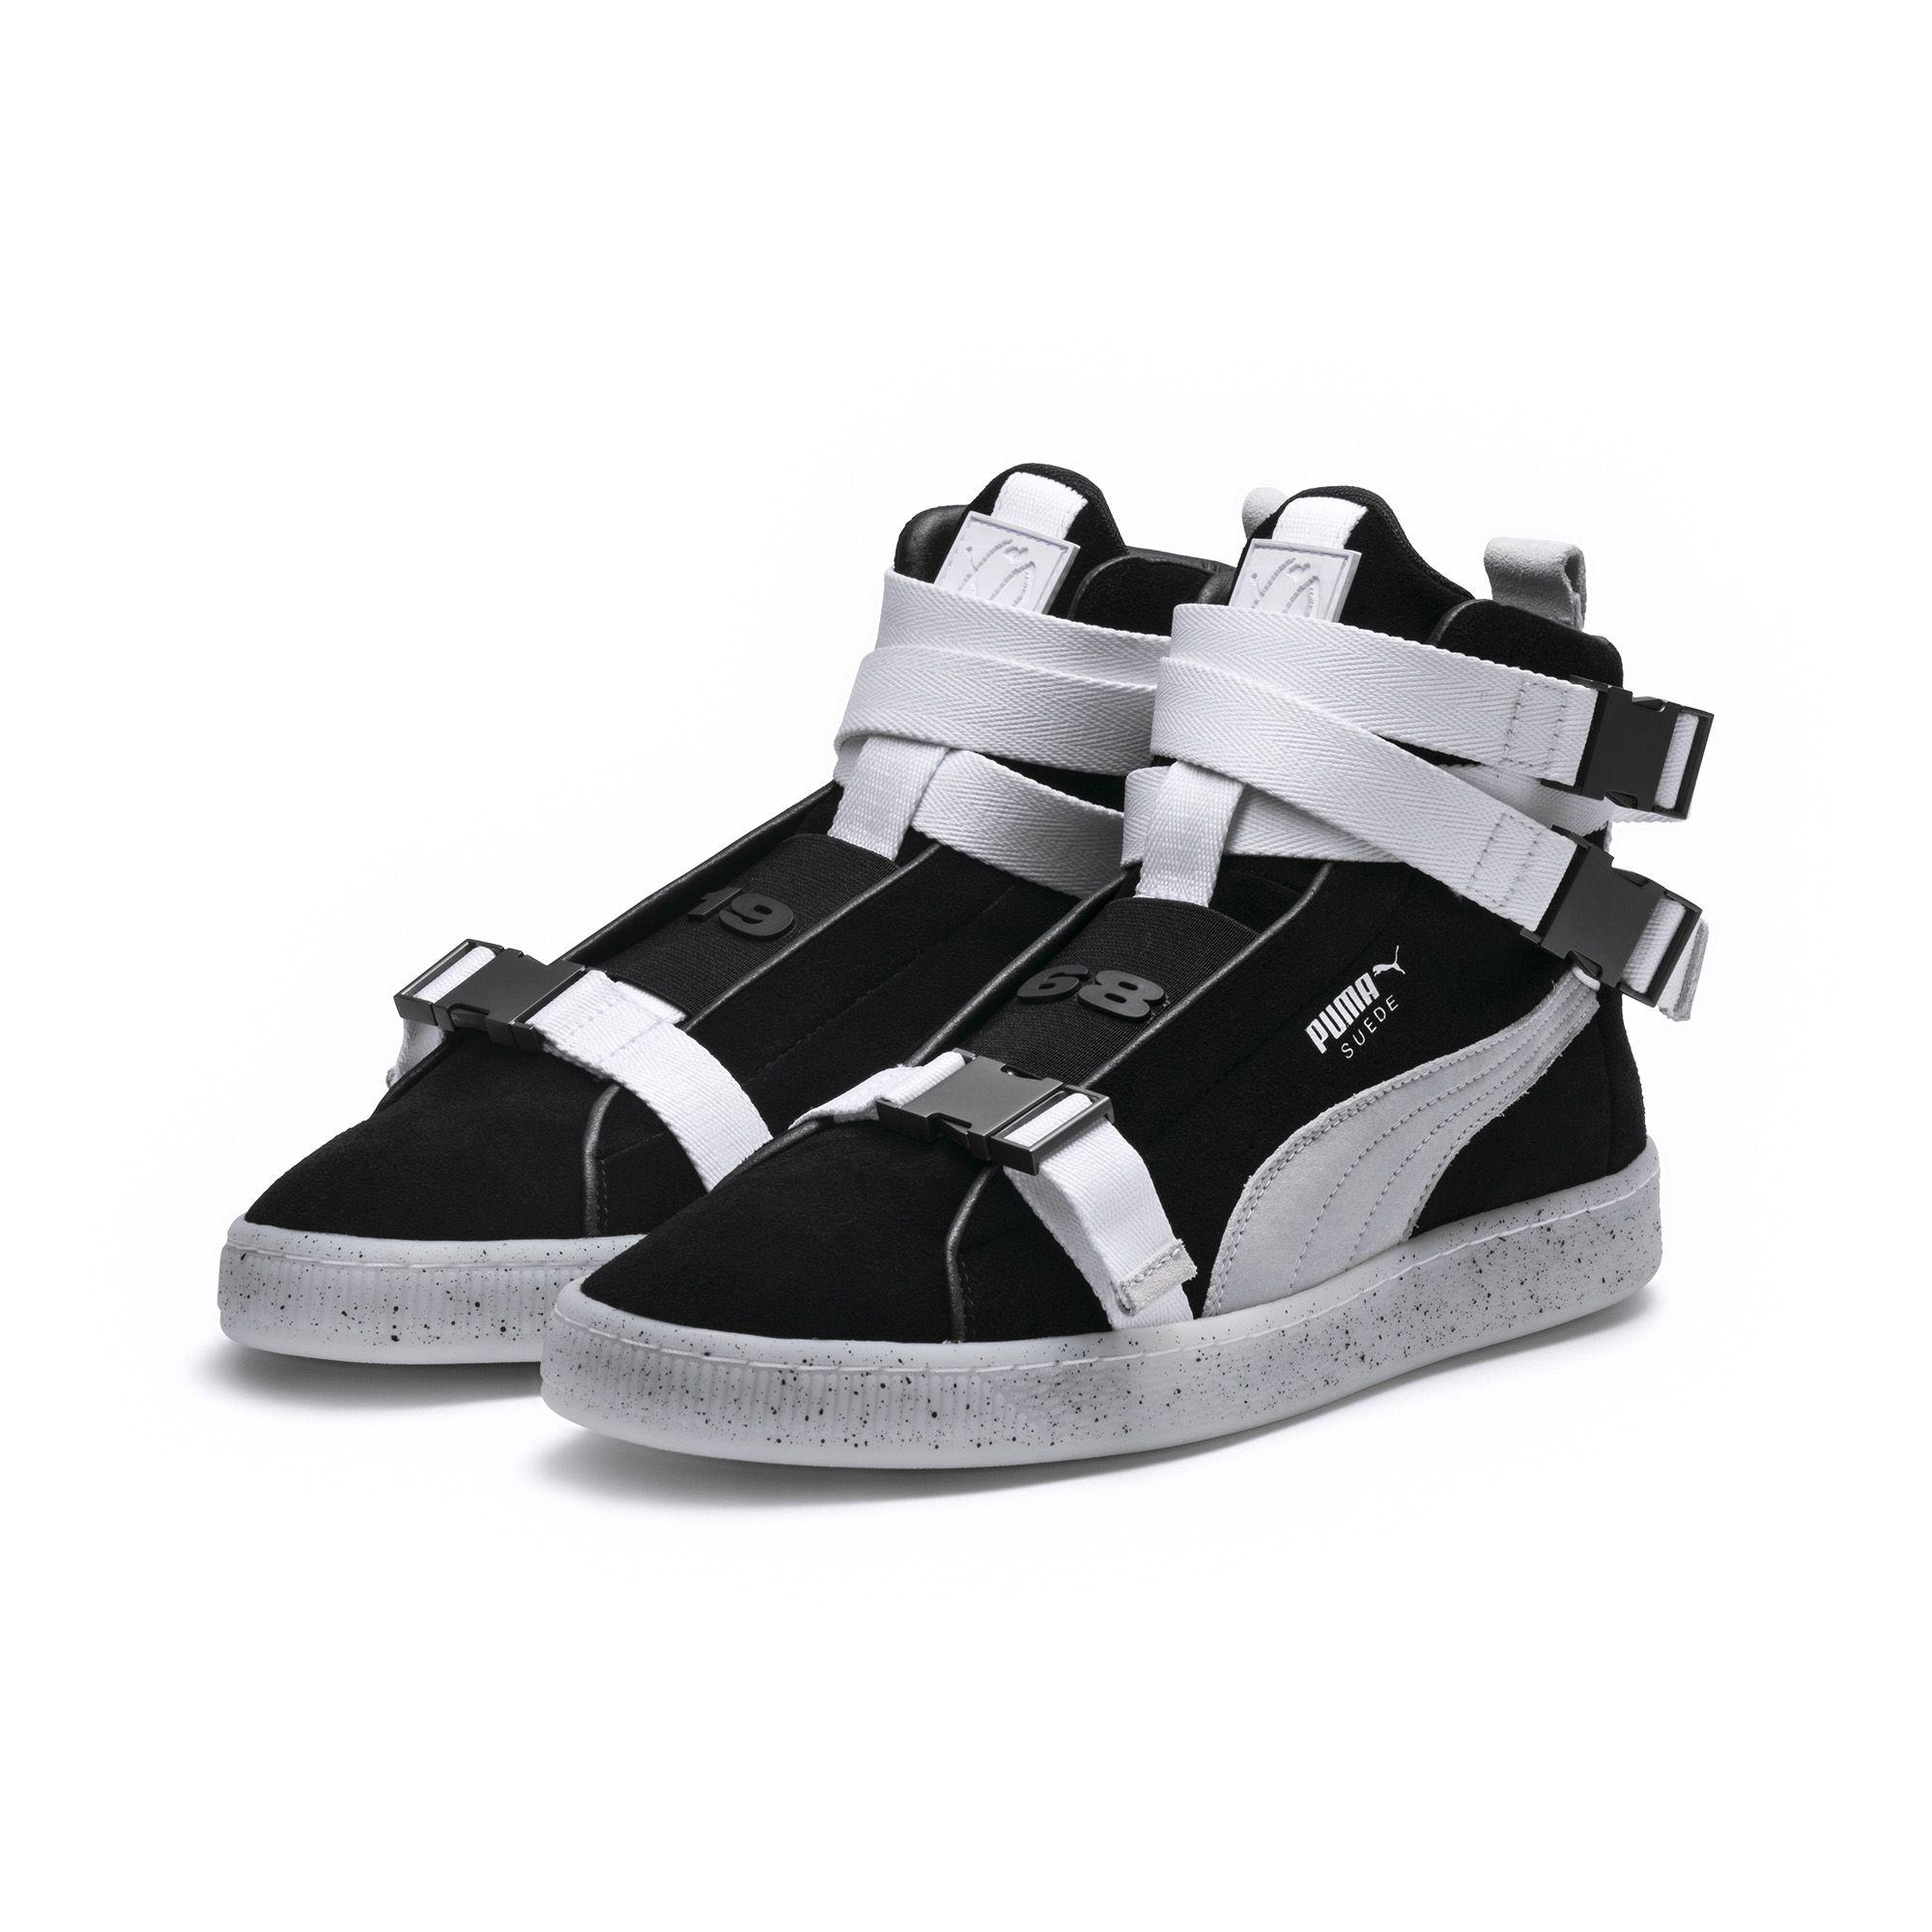 Lyst - PUMA X Xo Suede Classic Sneakers in Black for Men 29416b1bd